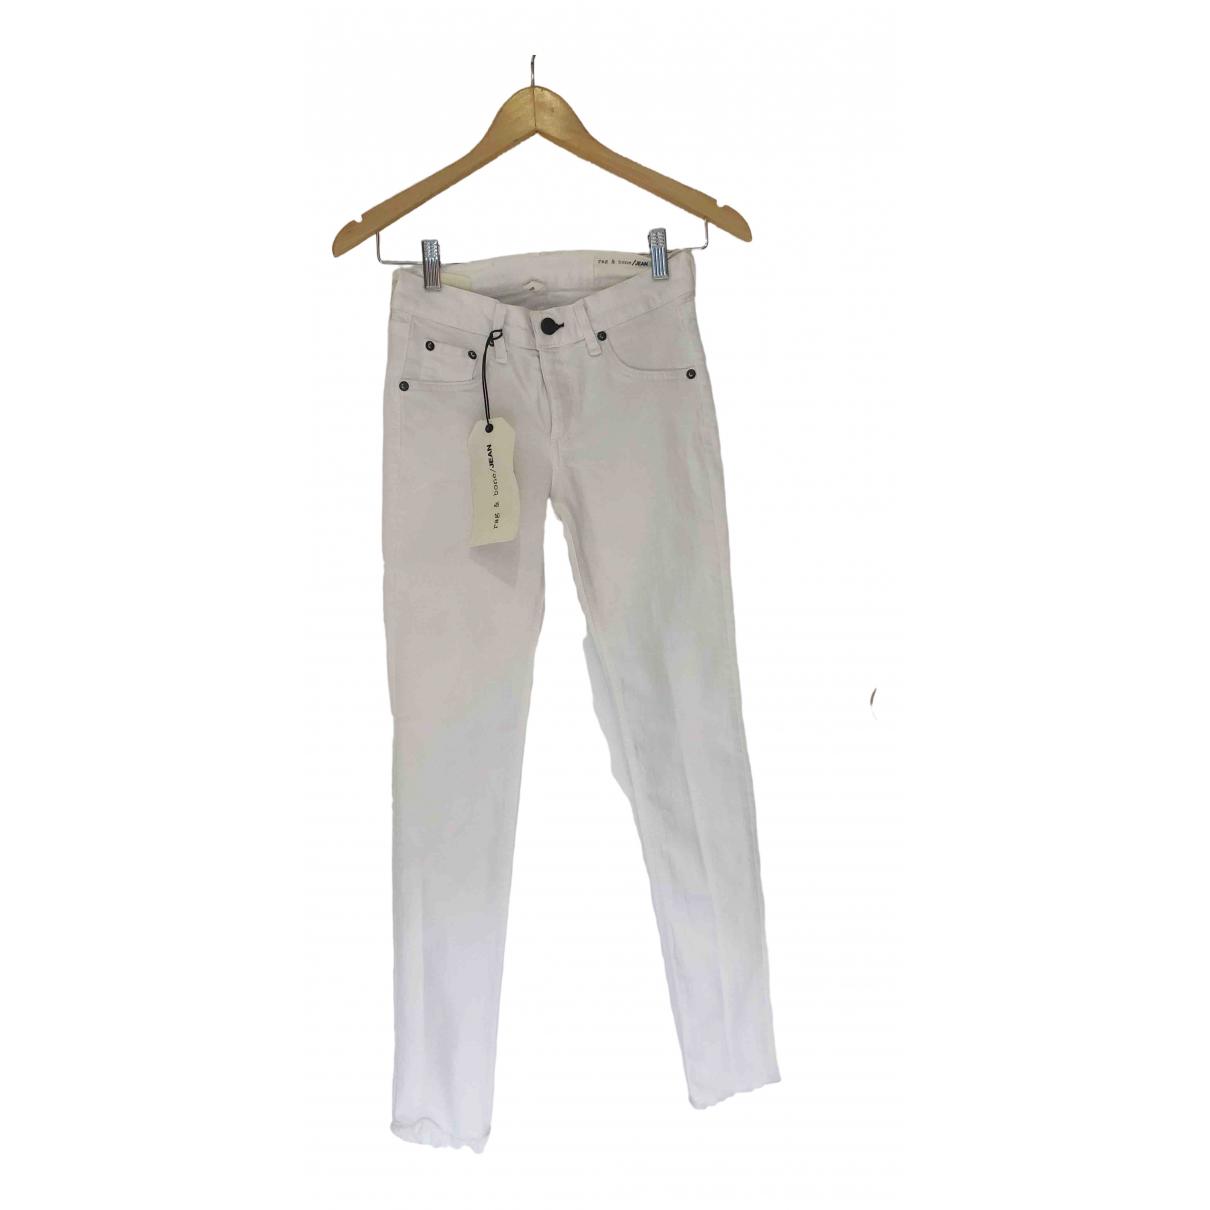 Rag & Bone \N White Cotton - elasthane Jeans for Women 25 US